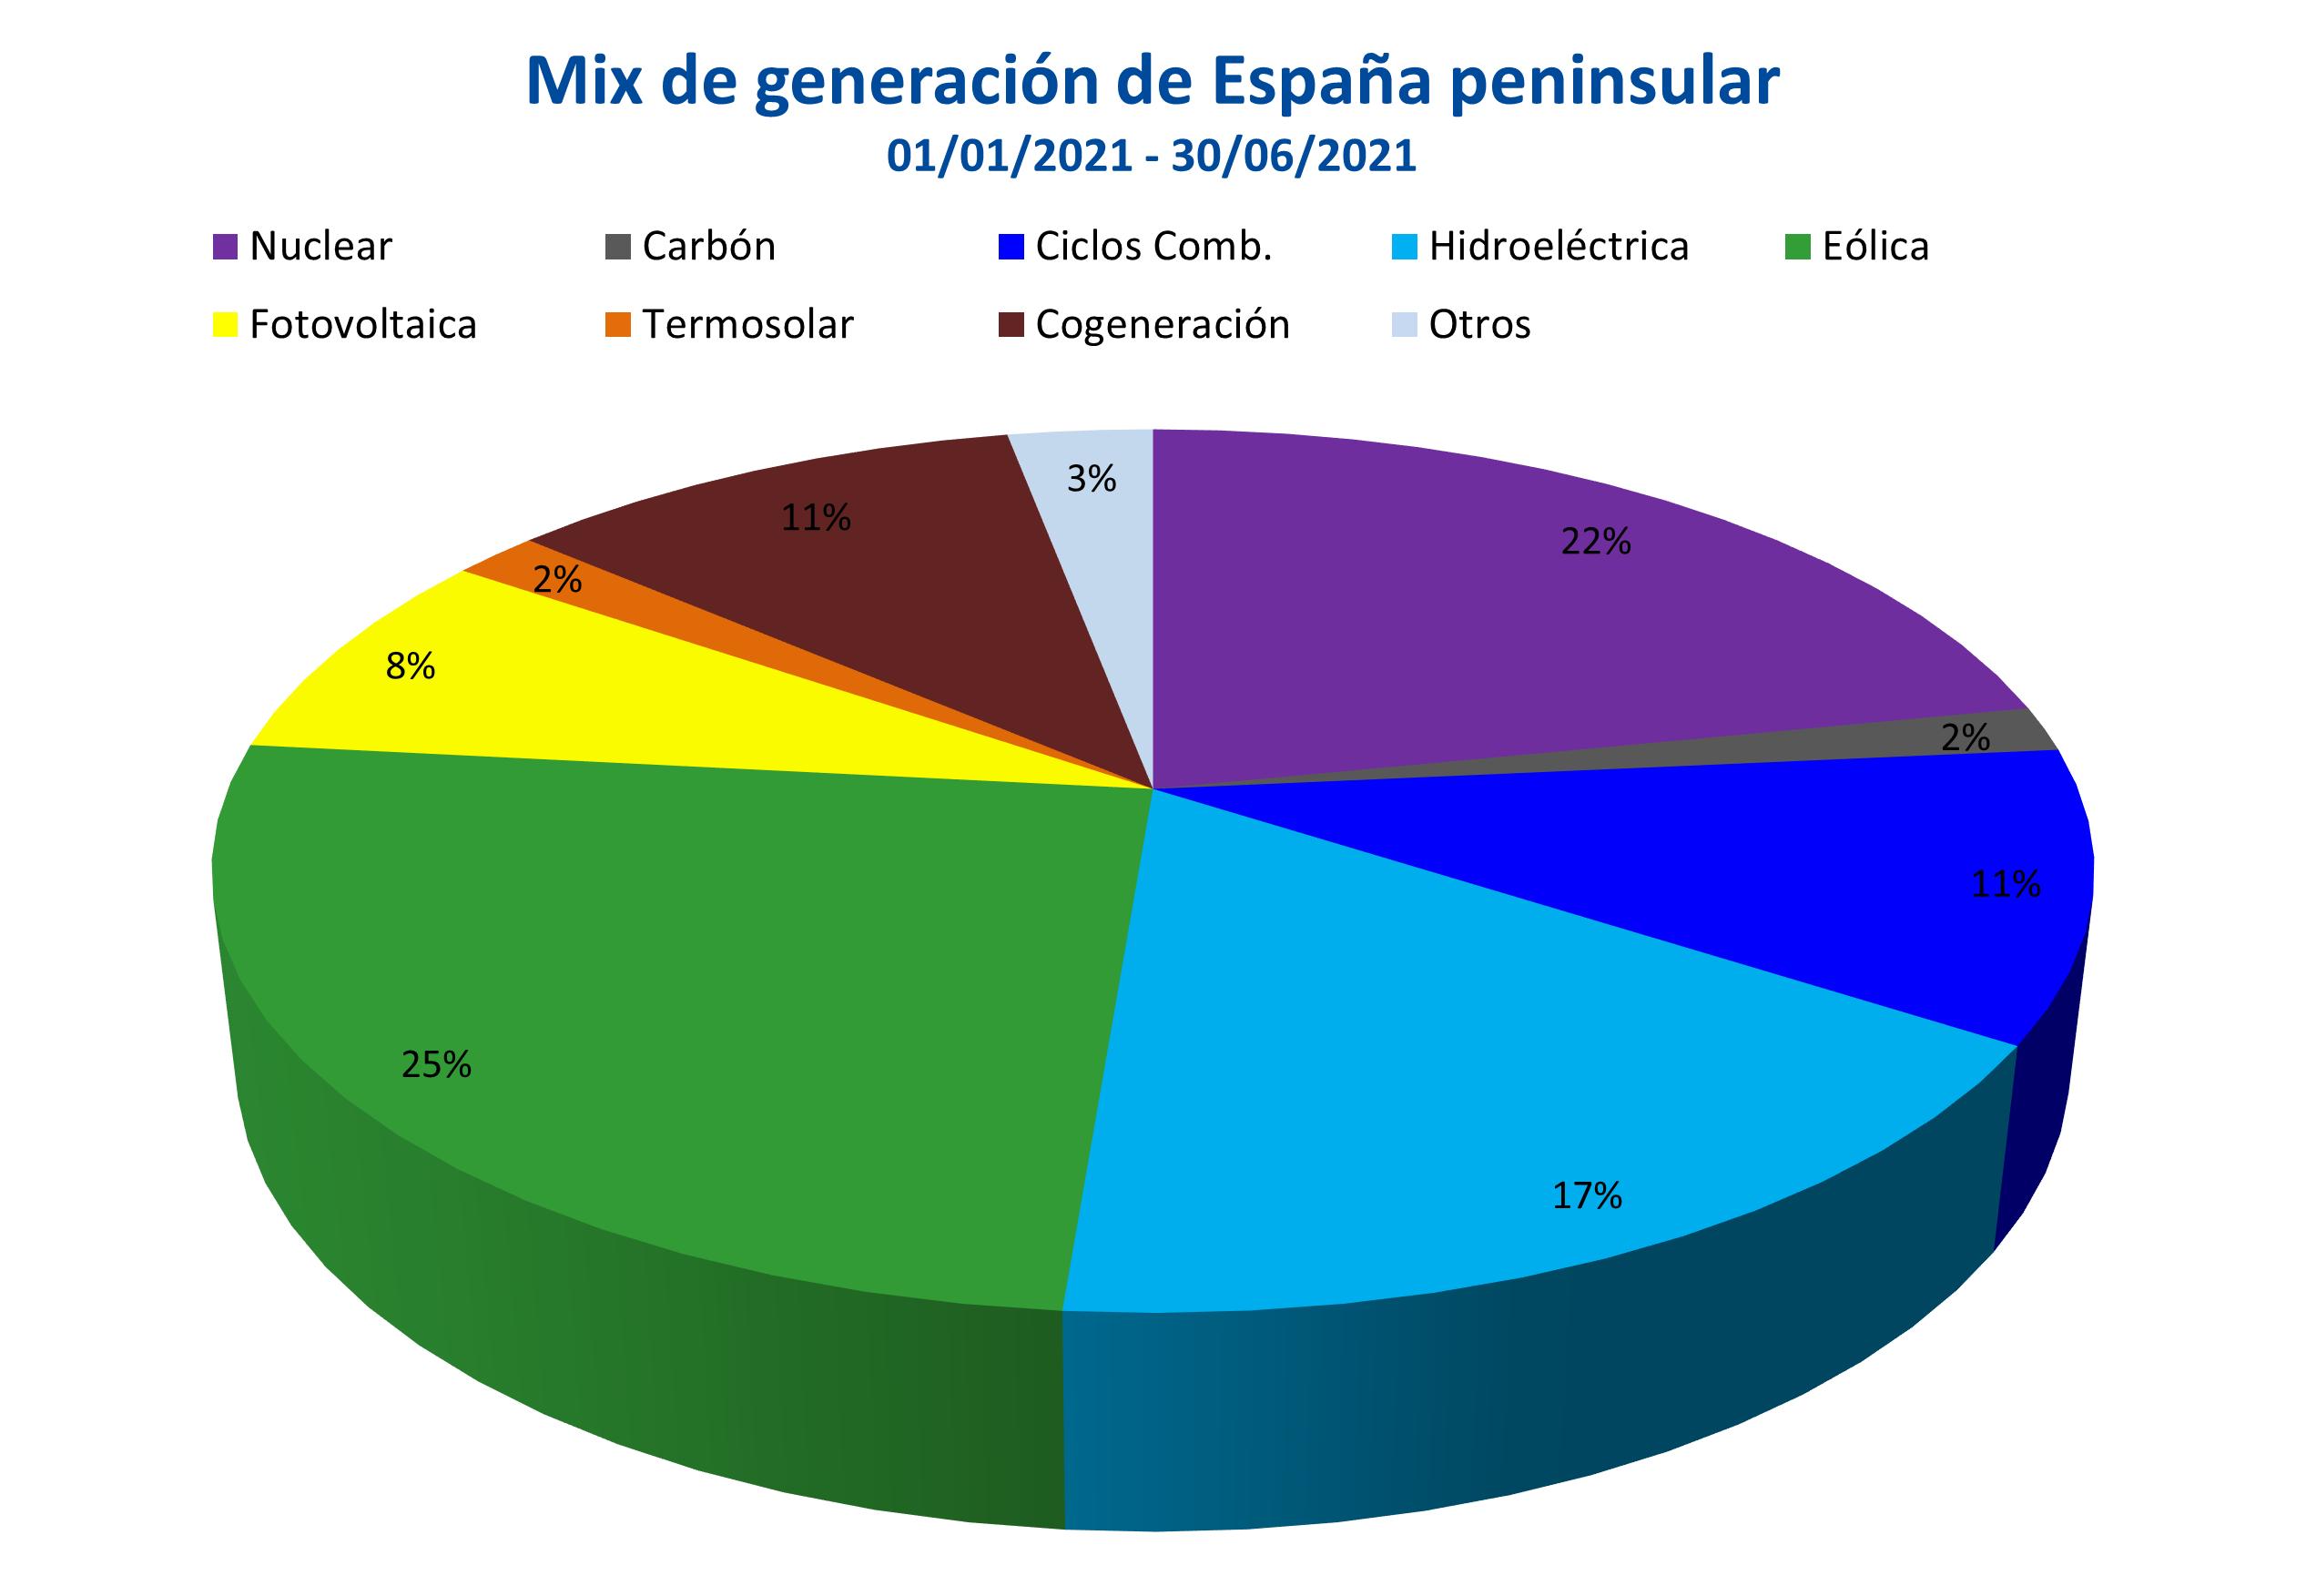 AleaSoft - Mix generacion Espana